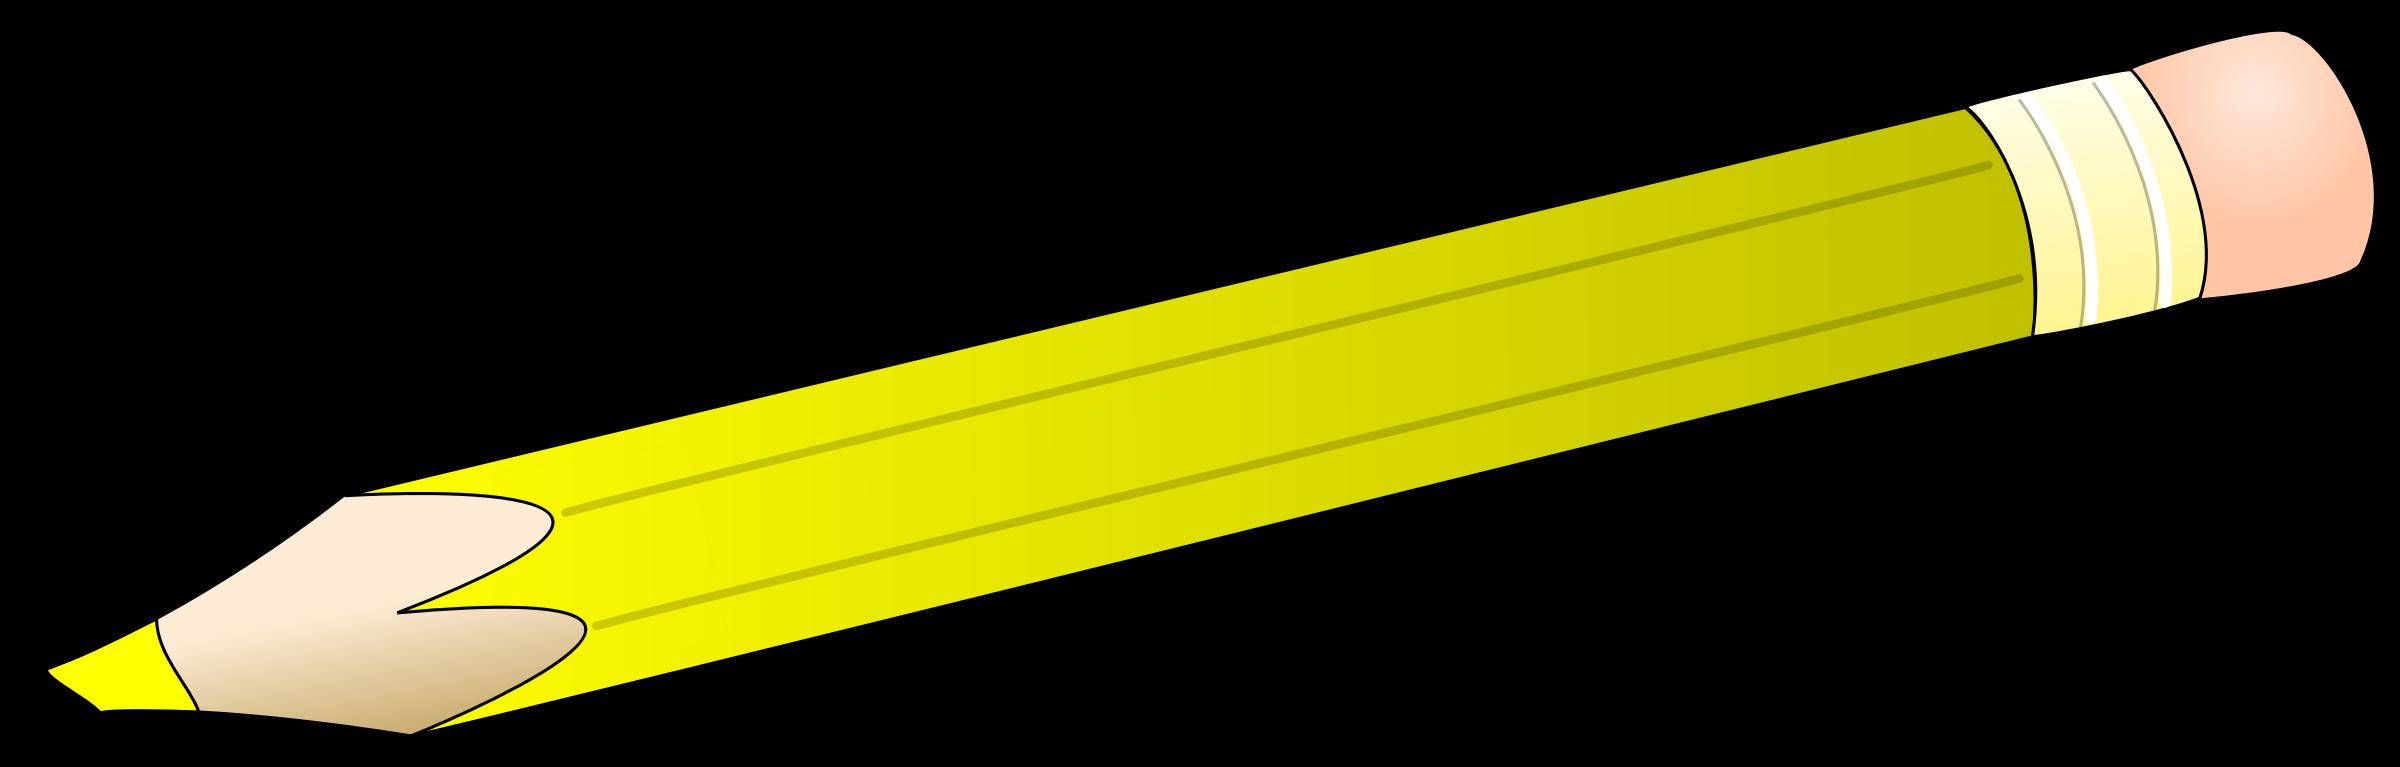 yellow belt clipart - photo #50